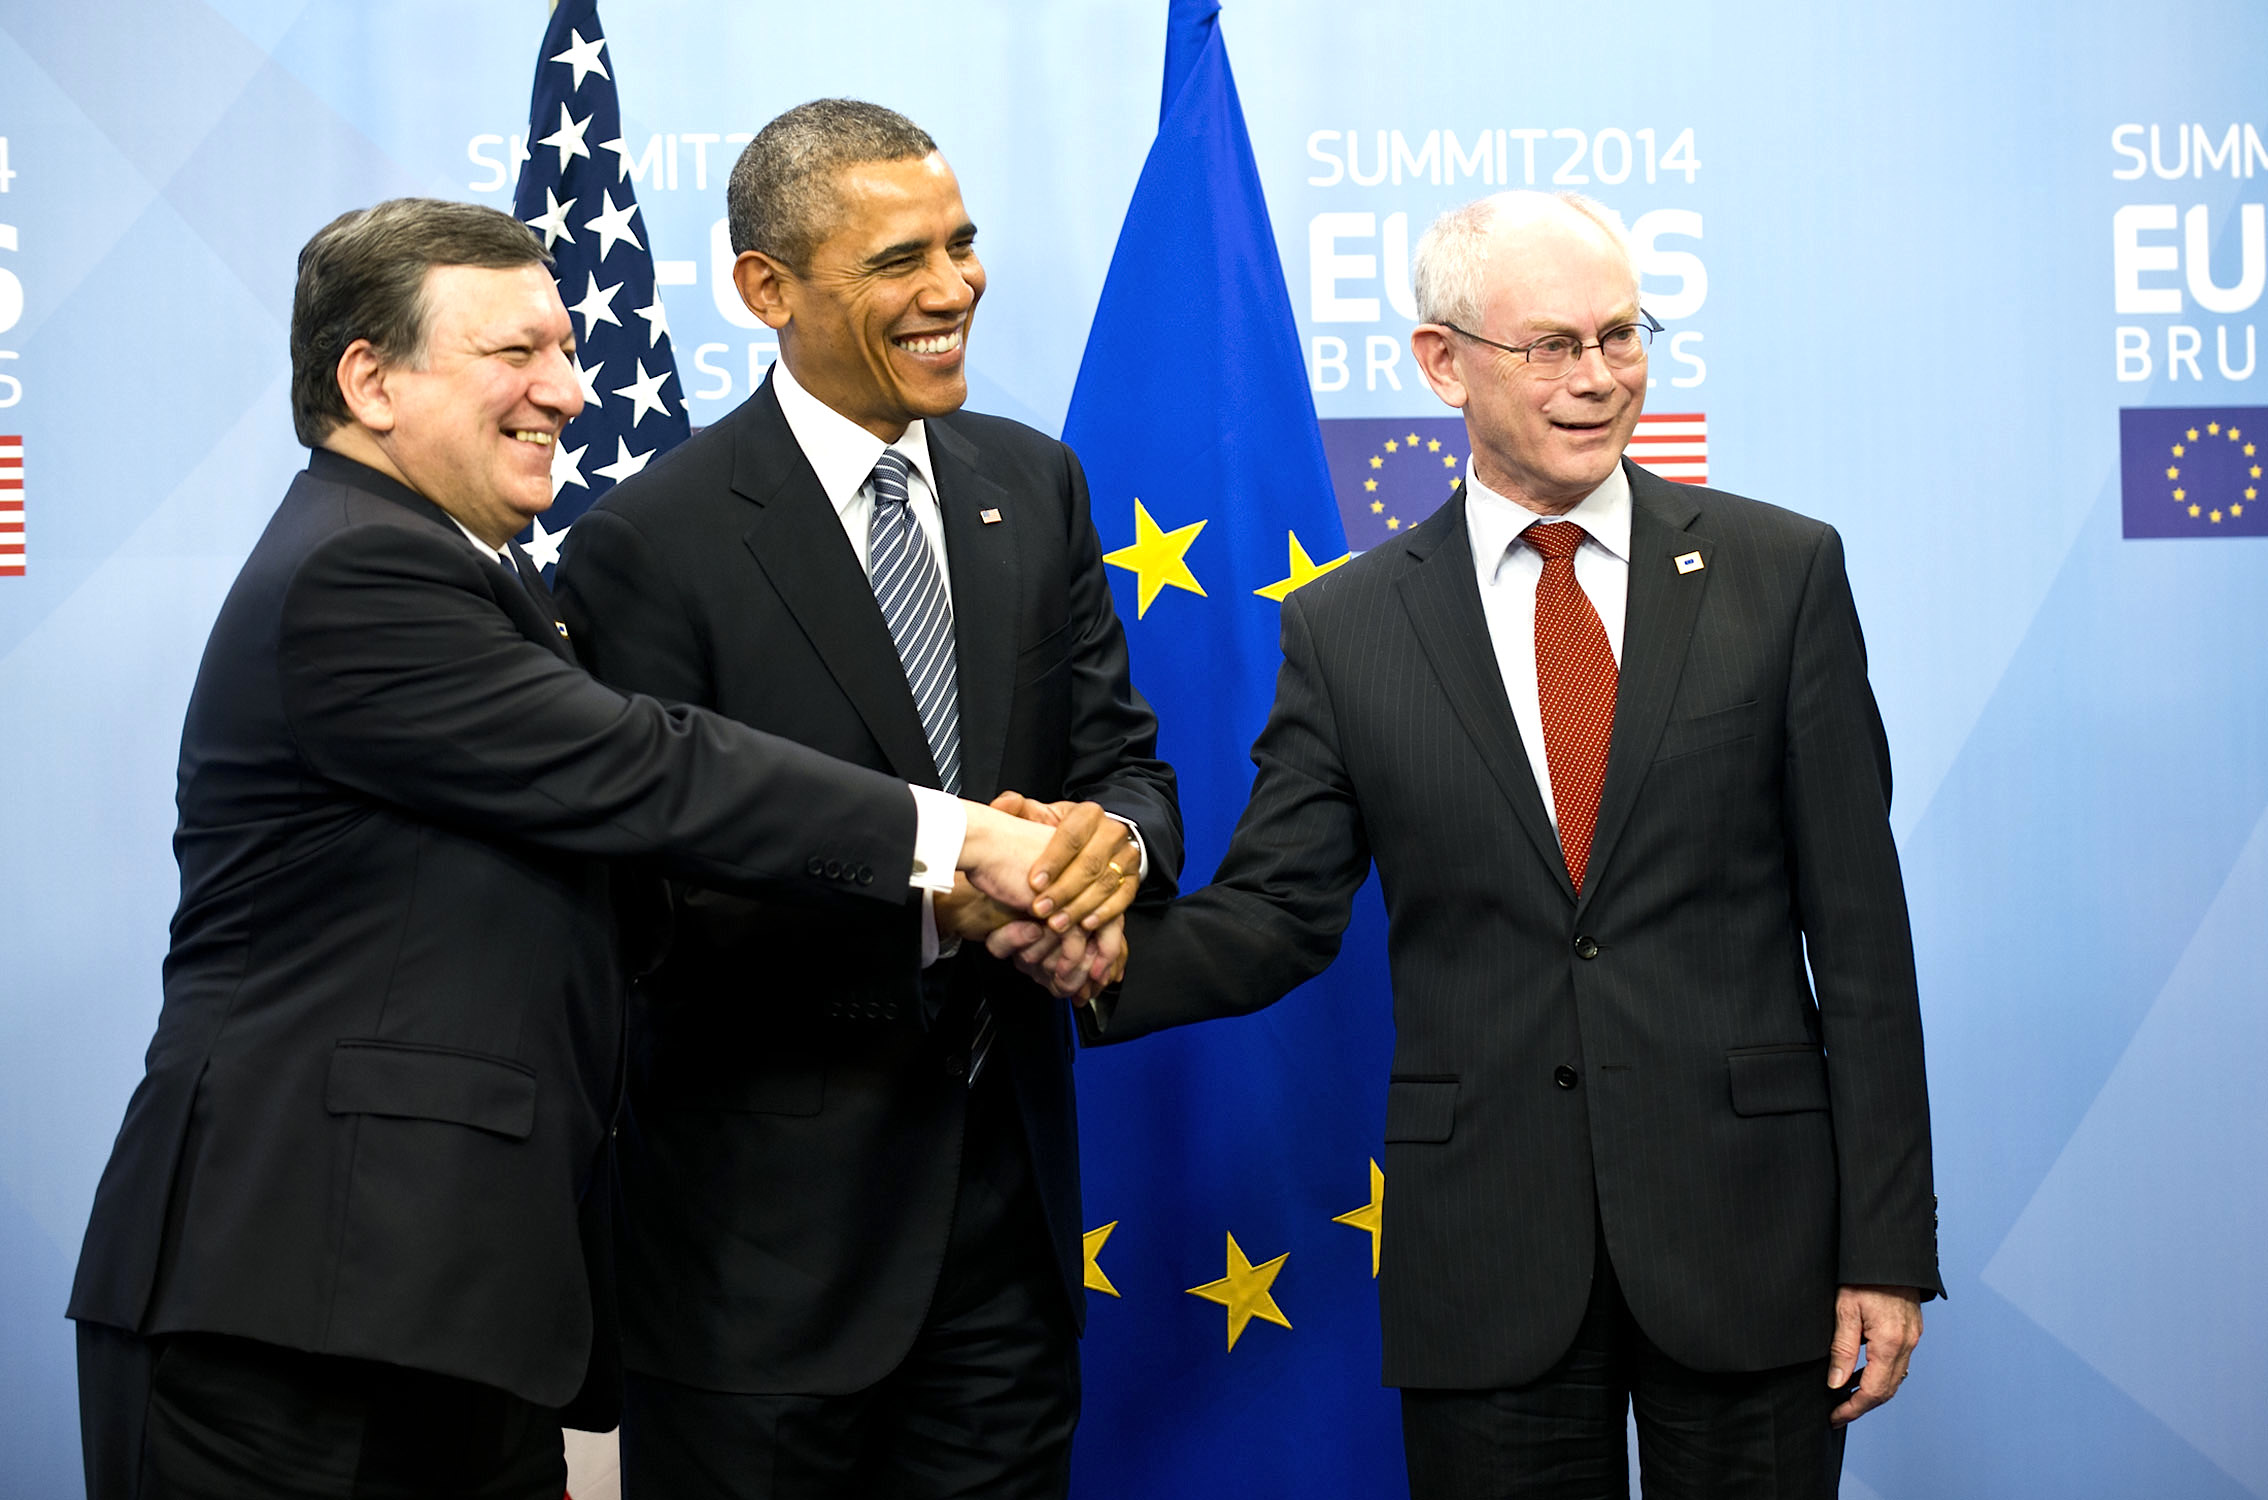 Ešte jedna fotka na doplnenie: Obama, Rom Chuj a Barozo